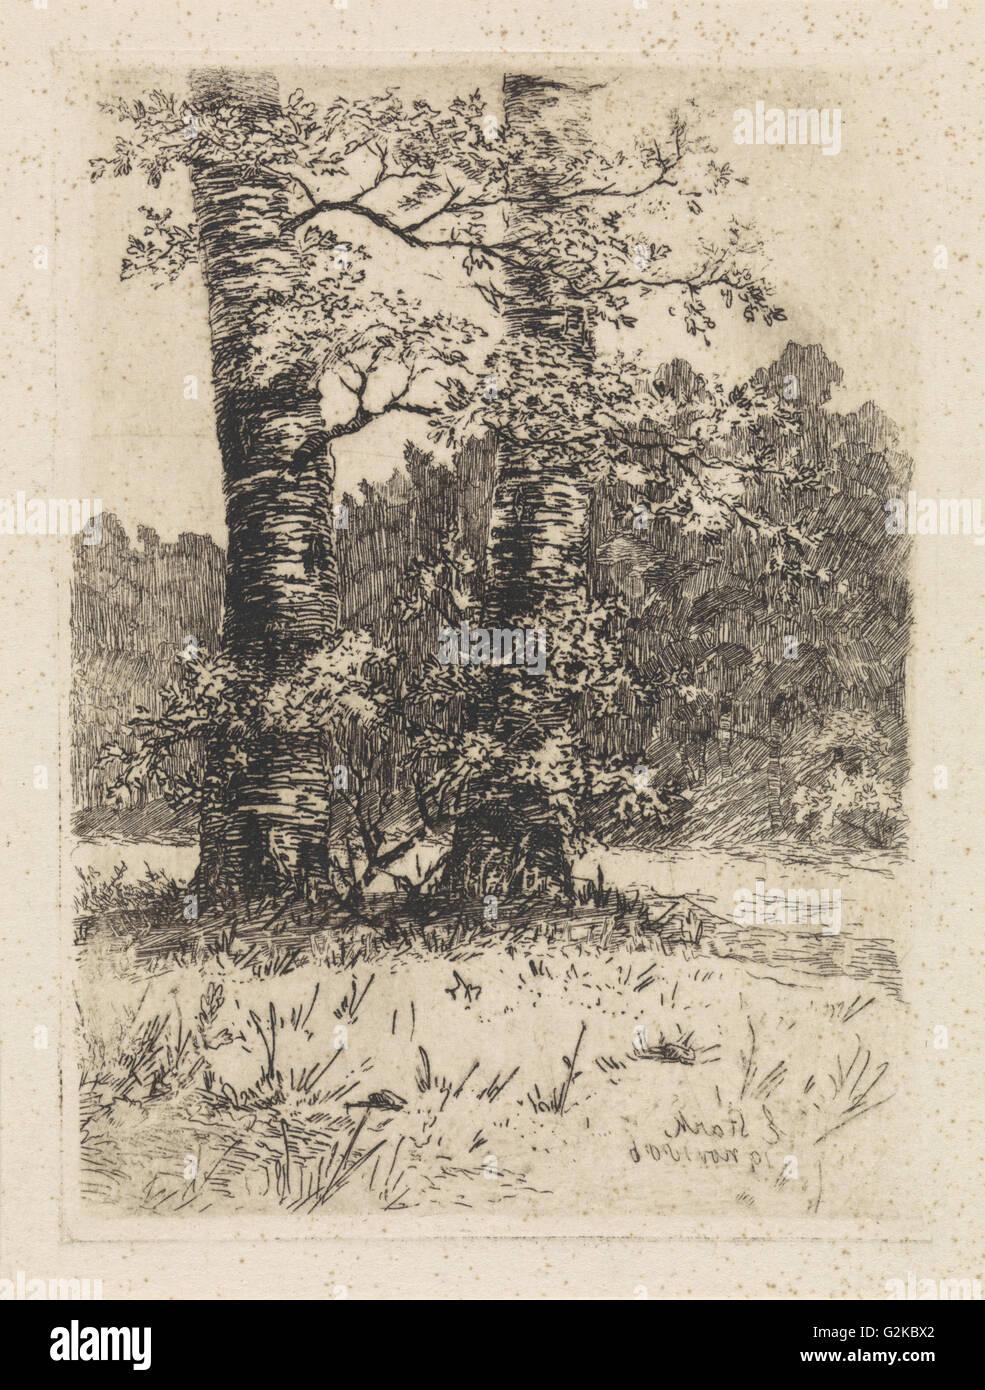 Two trees, Elias Stark, 1886 - Stock Image